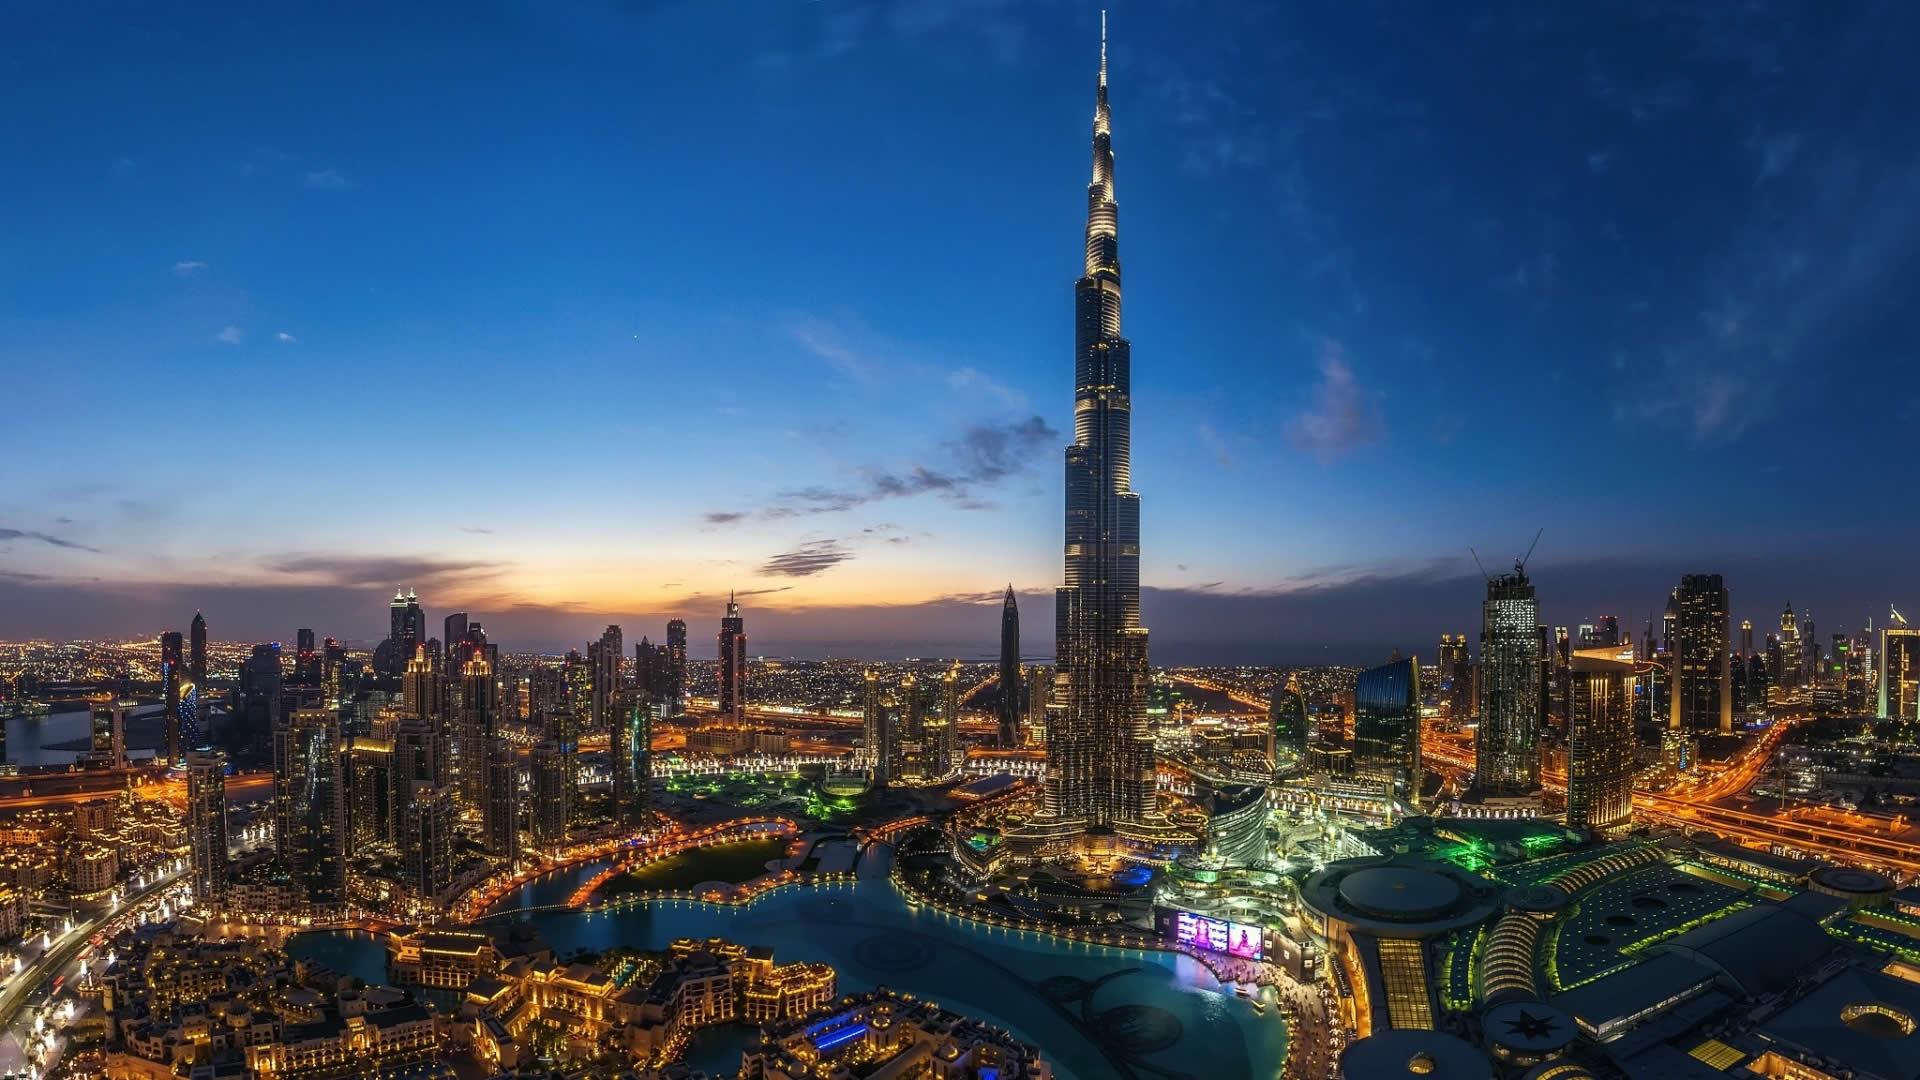 night_dubai_city_burj_khalifa